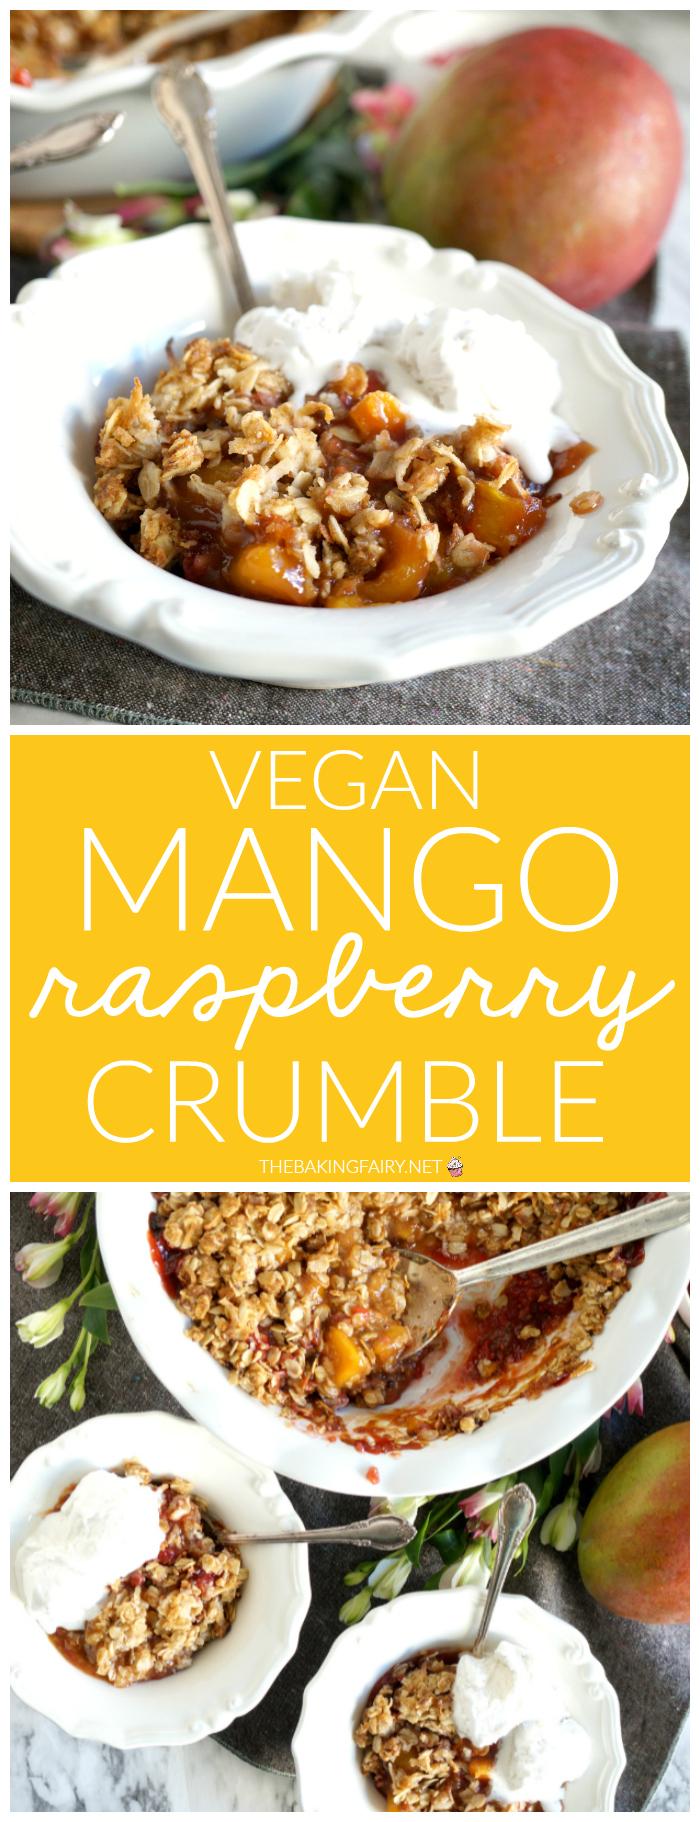 collage of mango raspberry crumble